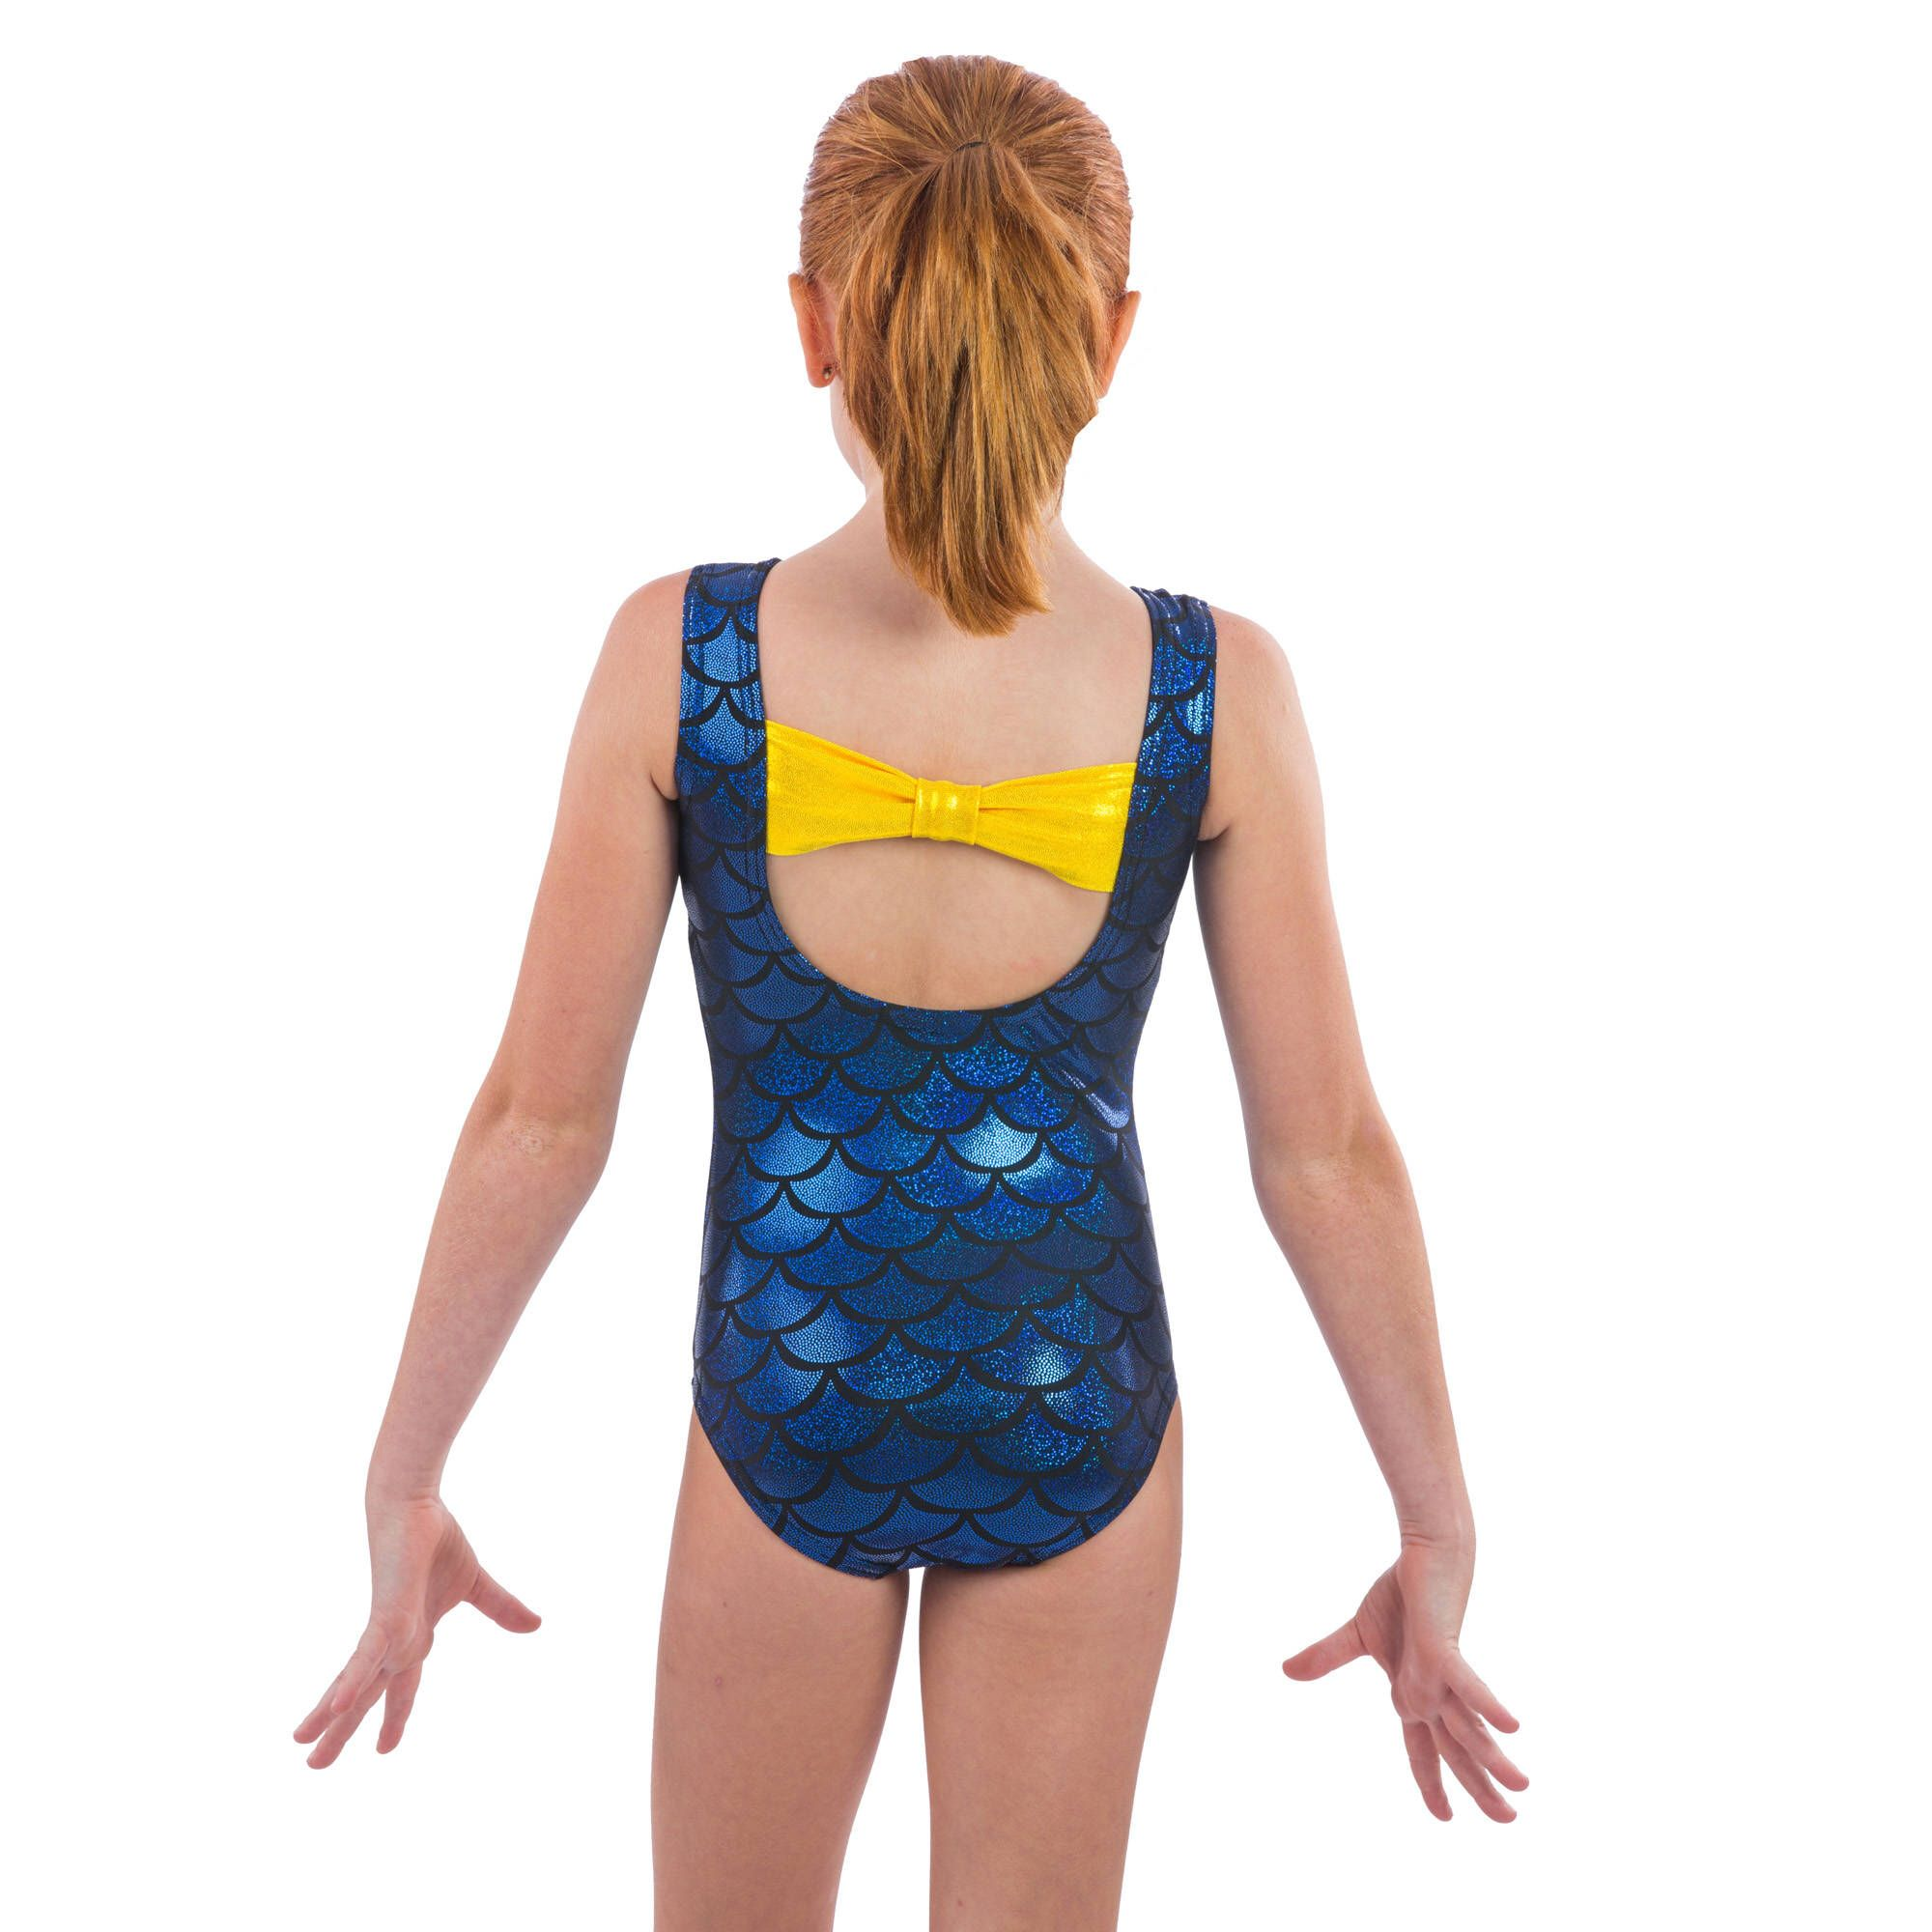 19b4d1e5f Lizatards Gymnastics Dance Rainbow Plaid Leotard in Girls Sizes with ...